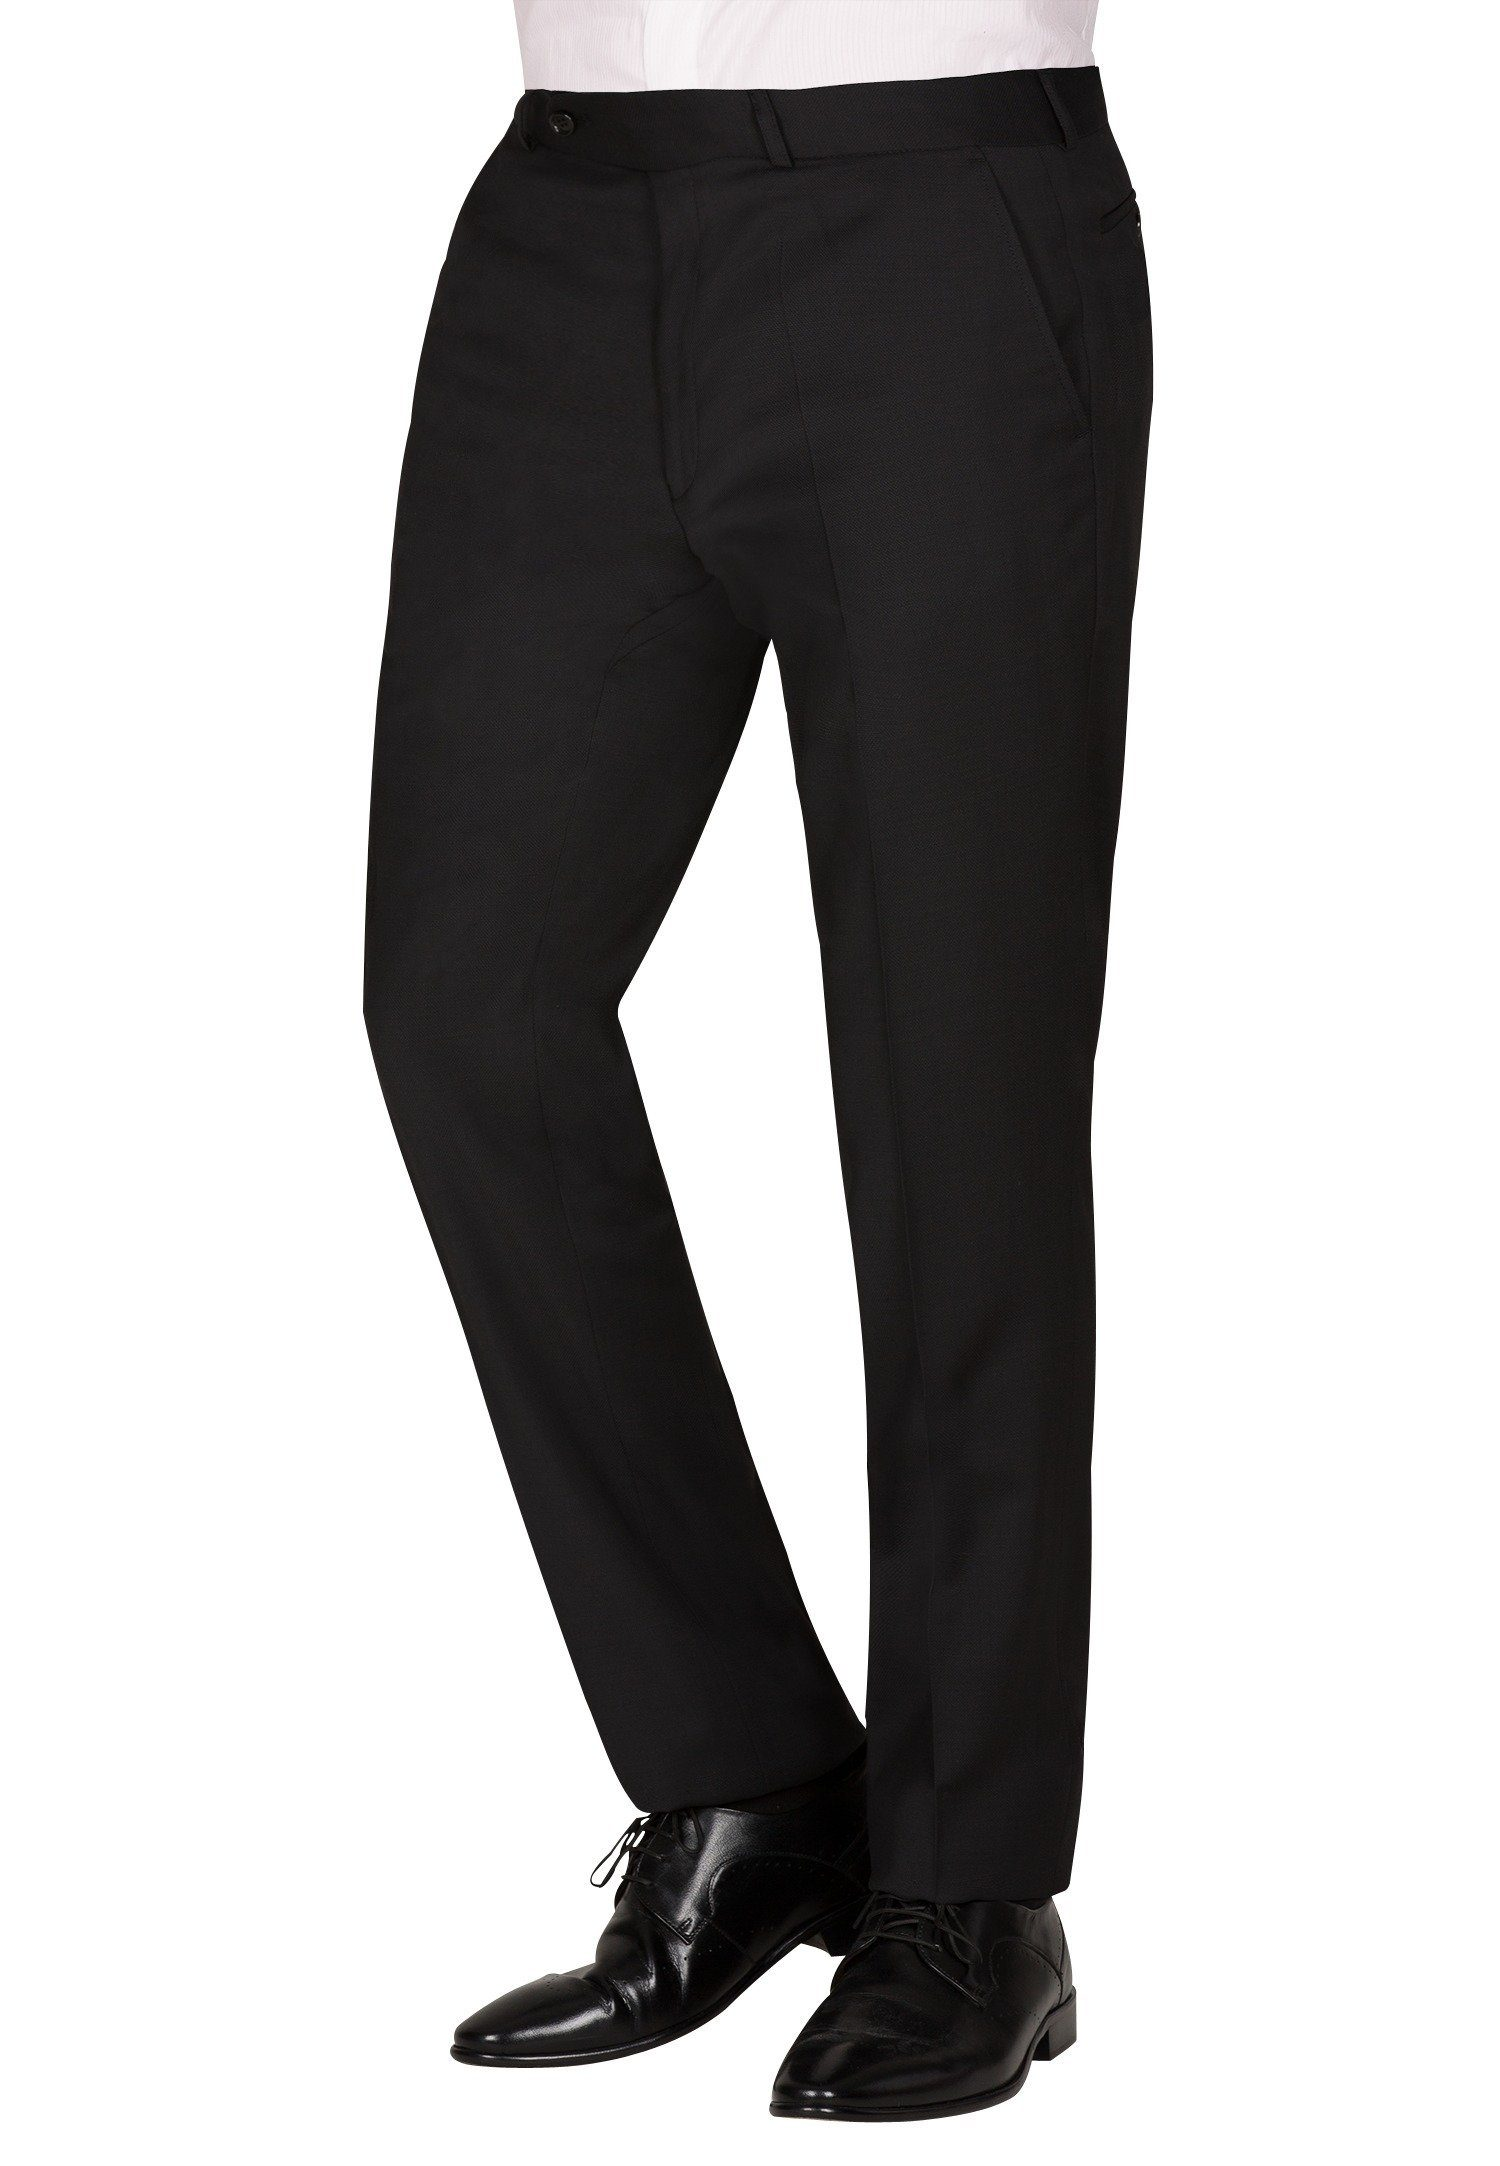 CARL GROSS Anzughose CG Frazer_A | Bekleidung > Hosen > Anzughosen | Schwarz | Schurwolle - Baumwolle | Carl Gross